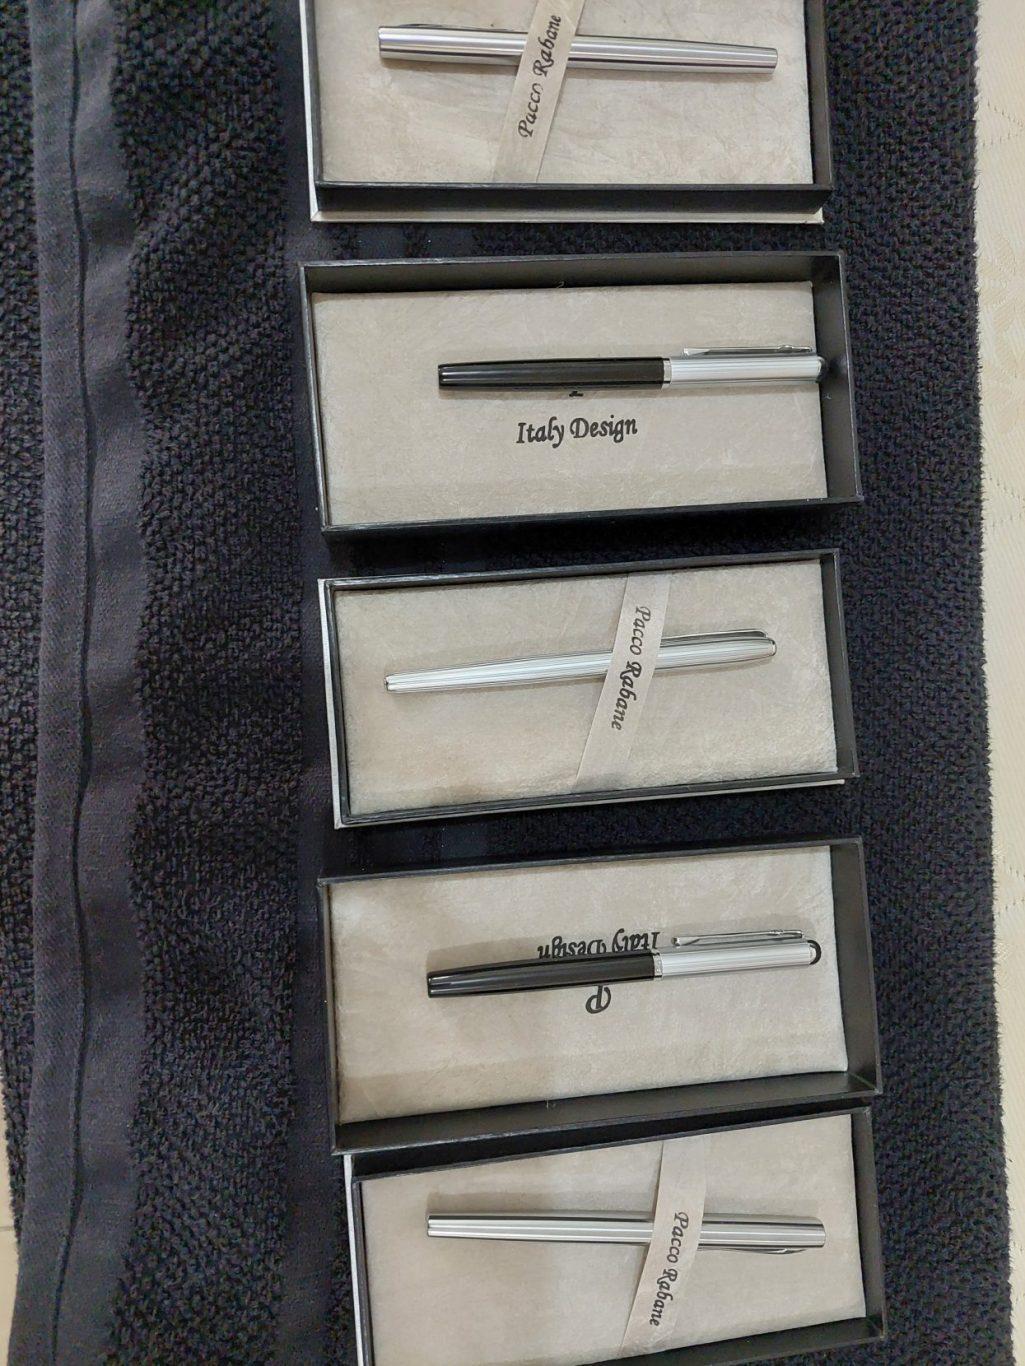 Original Pacco Rabane pens